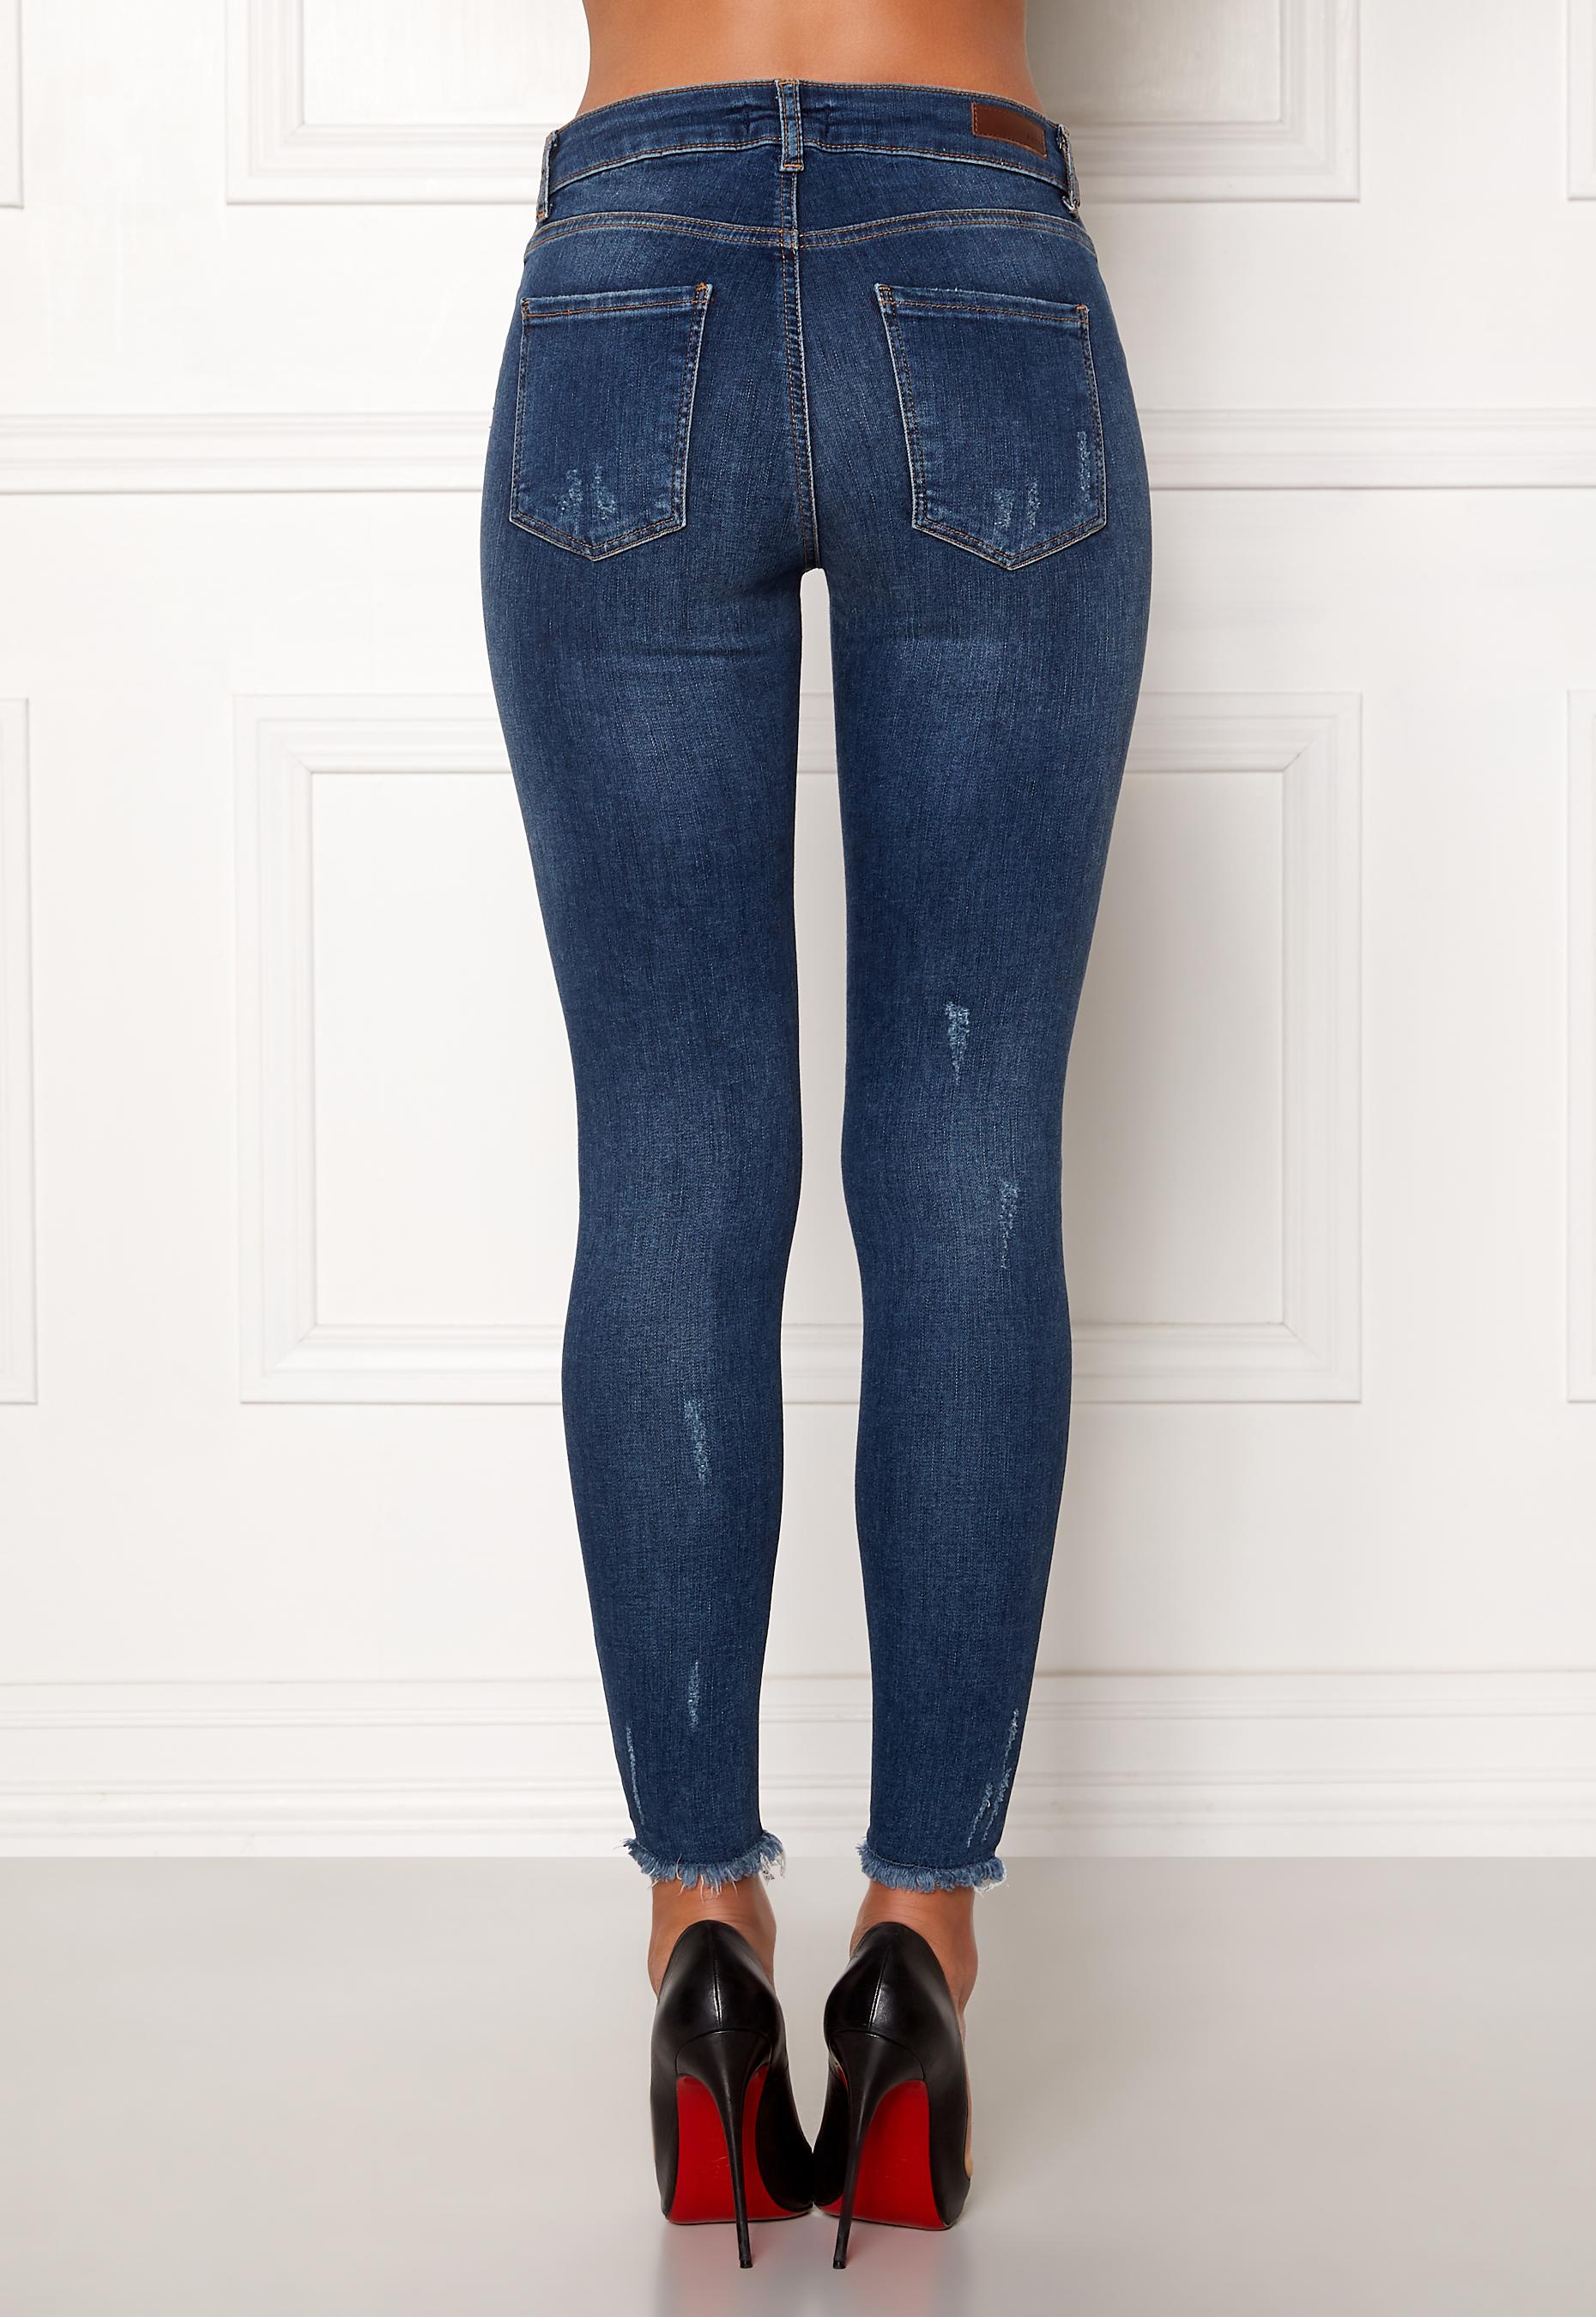 Pieces Five Delly MW B187 Jeans Medium Blue Denim - Bubbleroom 193bba5d2054c